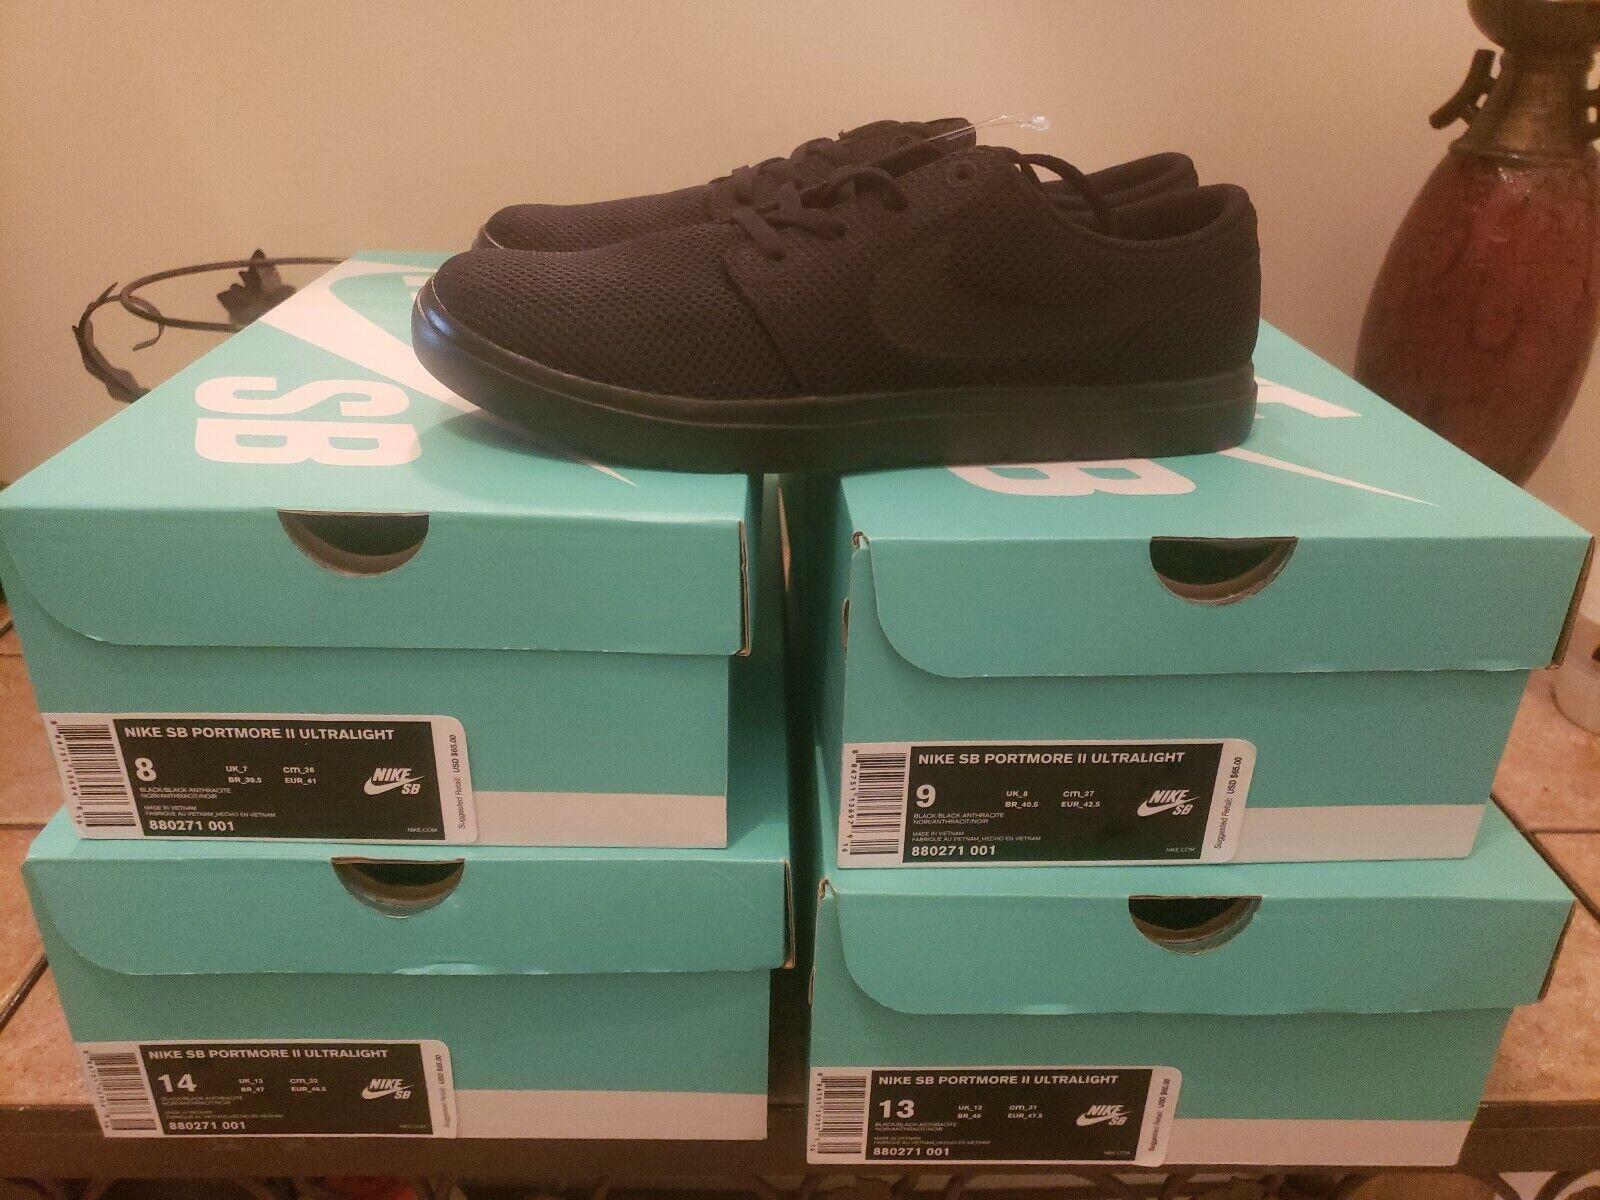 Nike Mens SB Portmore II Ultralight Cross Training shoes 880271-001  Sz.14. New